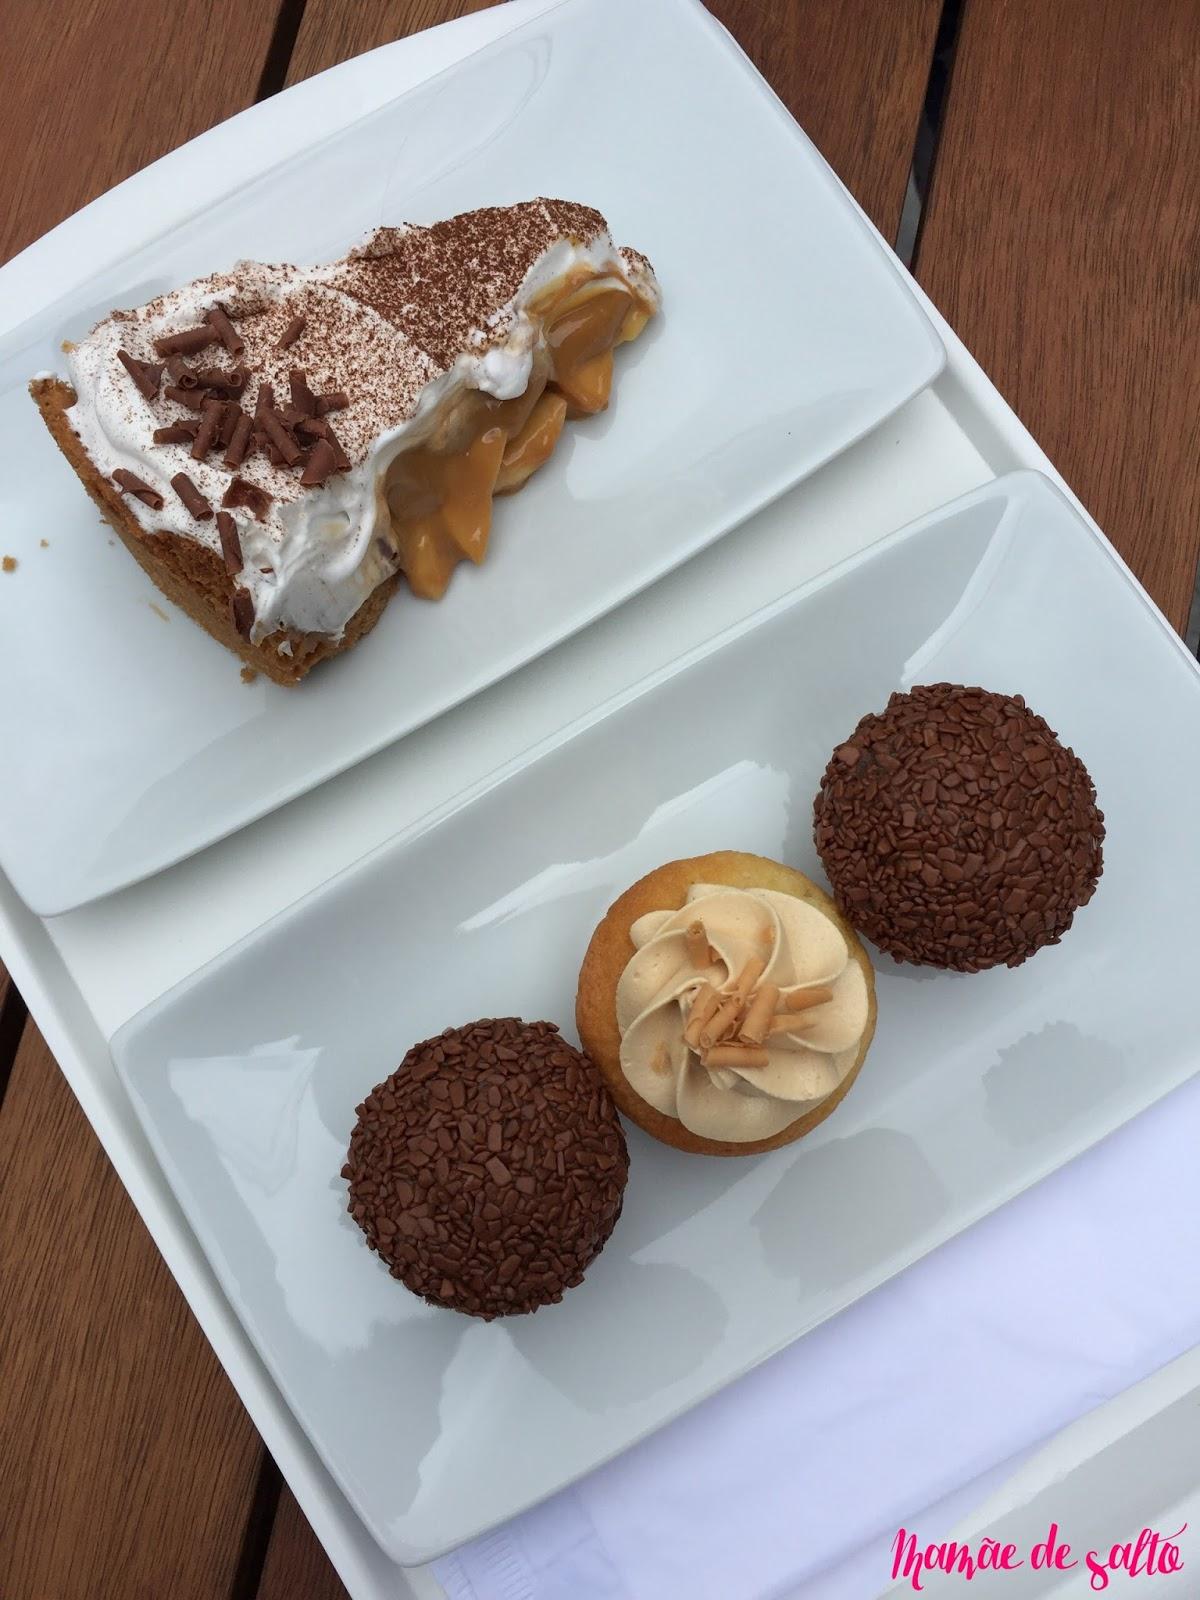 torta banoffe, cupcake chocolate belga e doce de leite Sugar Bakery Curitiba/PR ... blog Mamãe de Salto